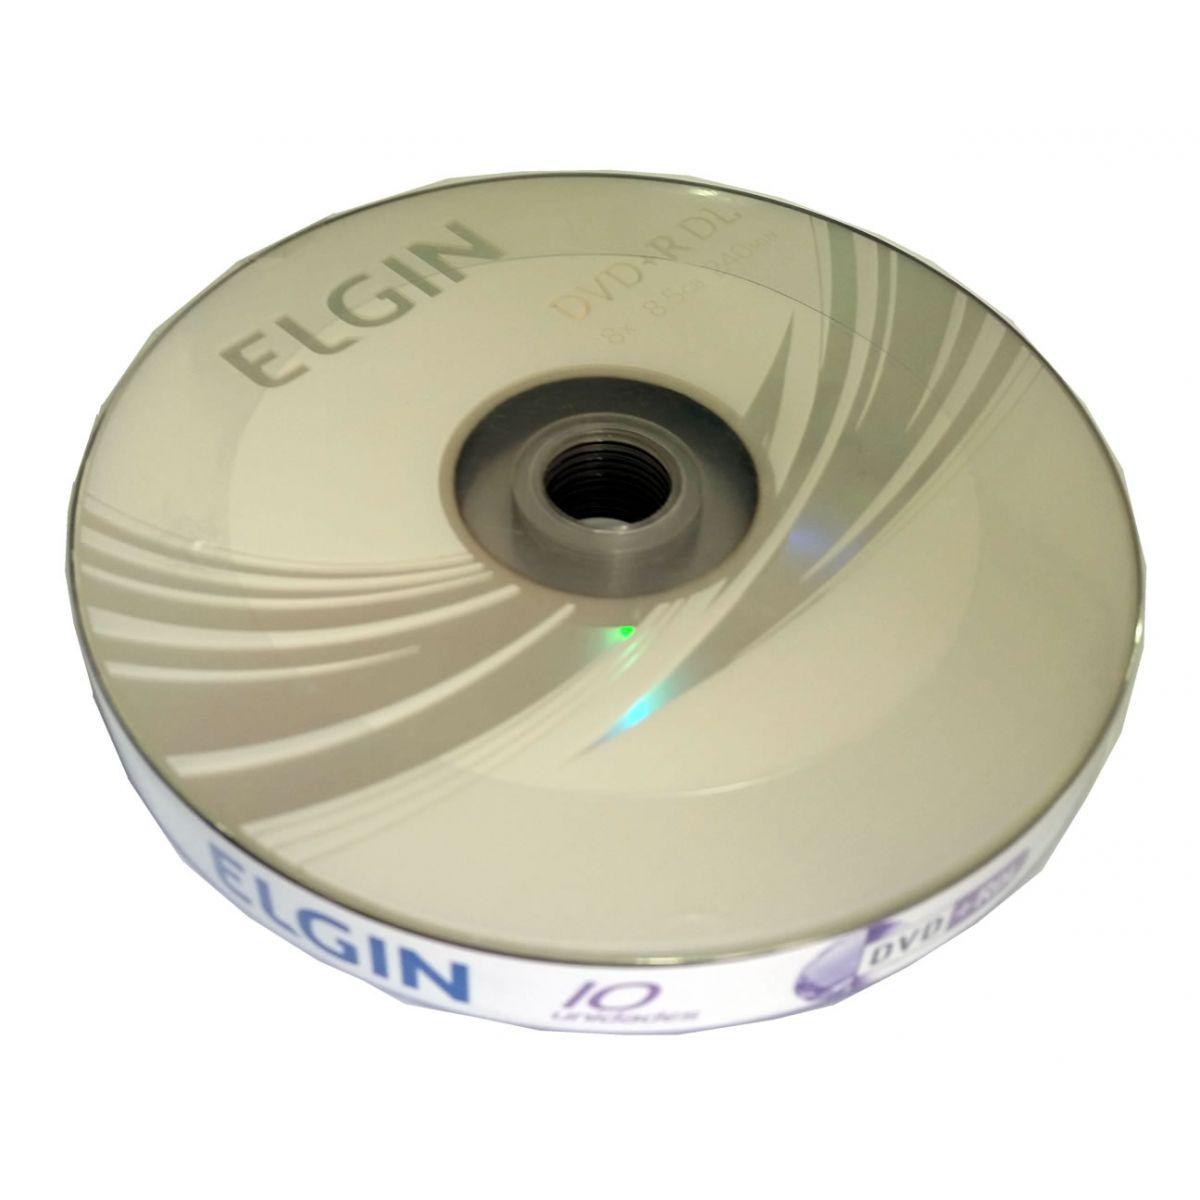 DVD+R DL Dual Layer 10 Mídias 8x 8.5GB 240min Umedisc Elgin